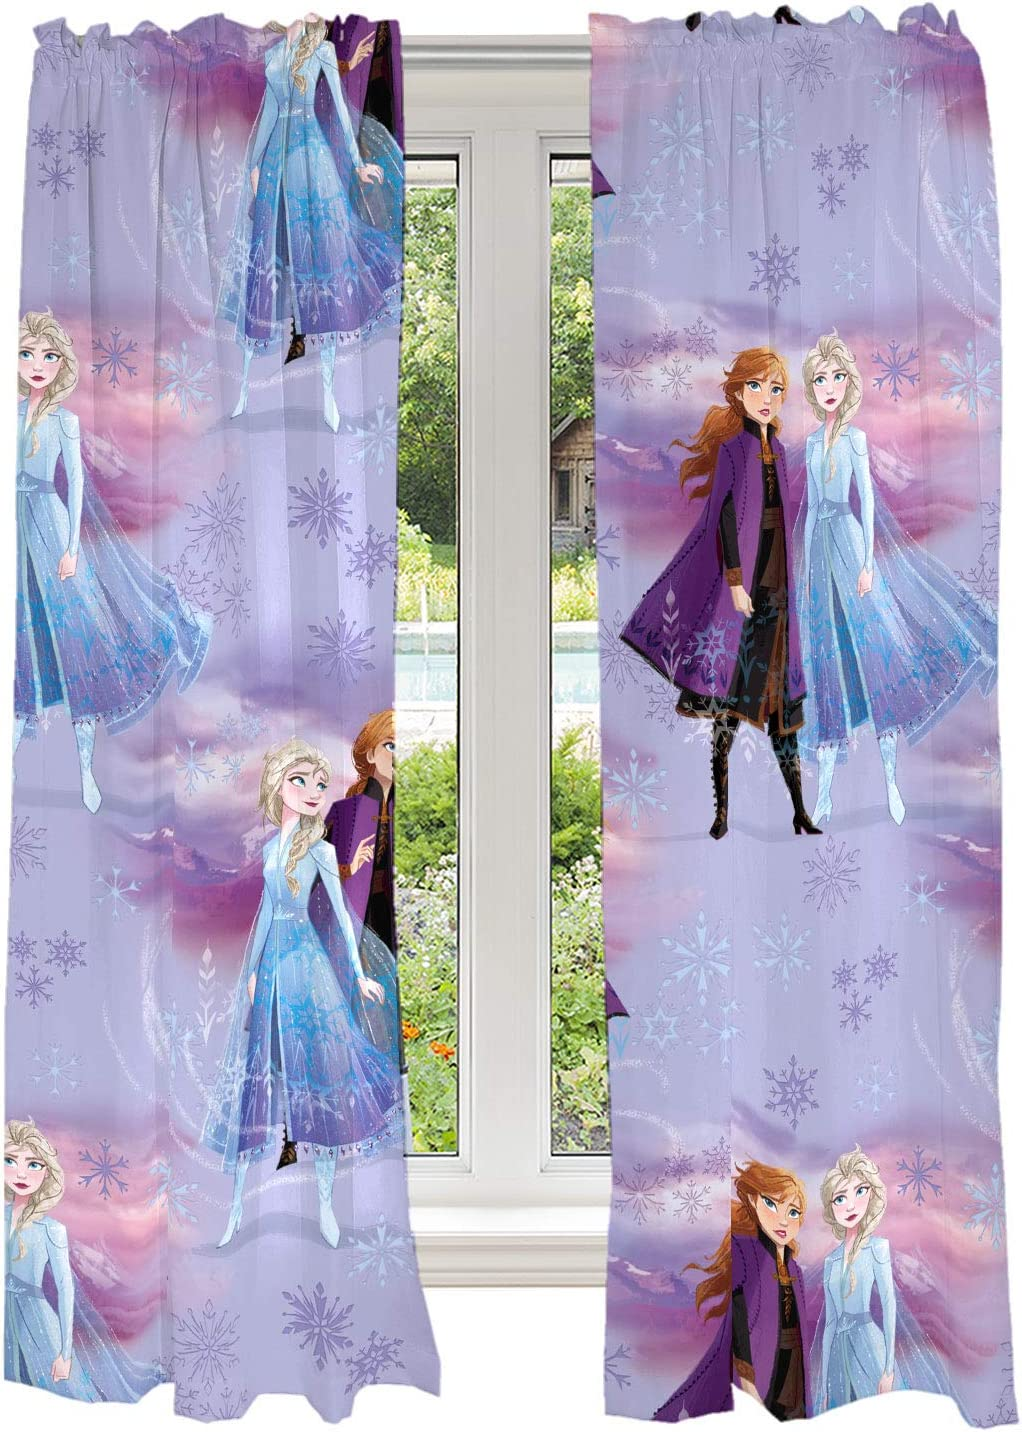 Franco Kids Room Window Curtains Drapes Set, 82